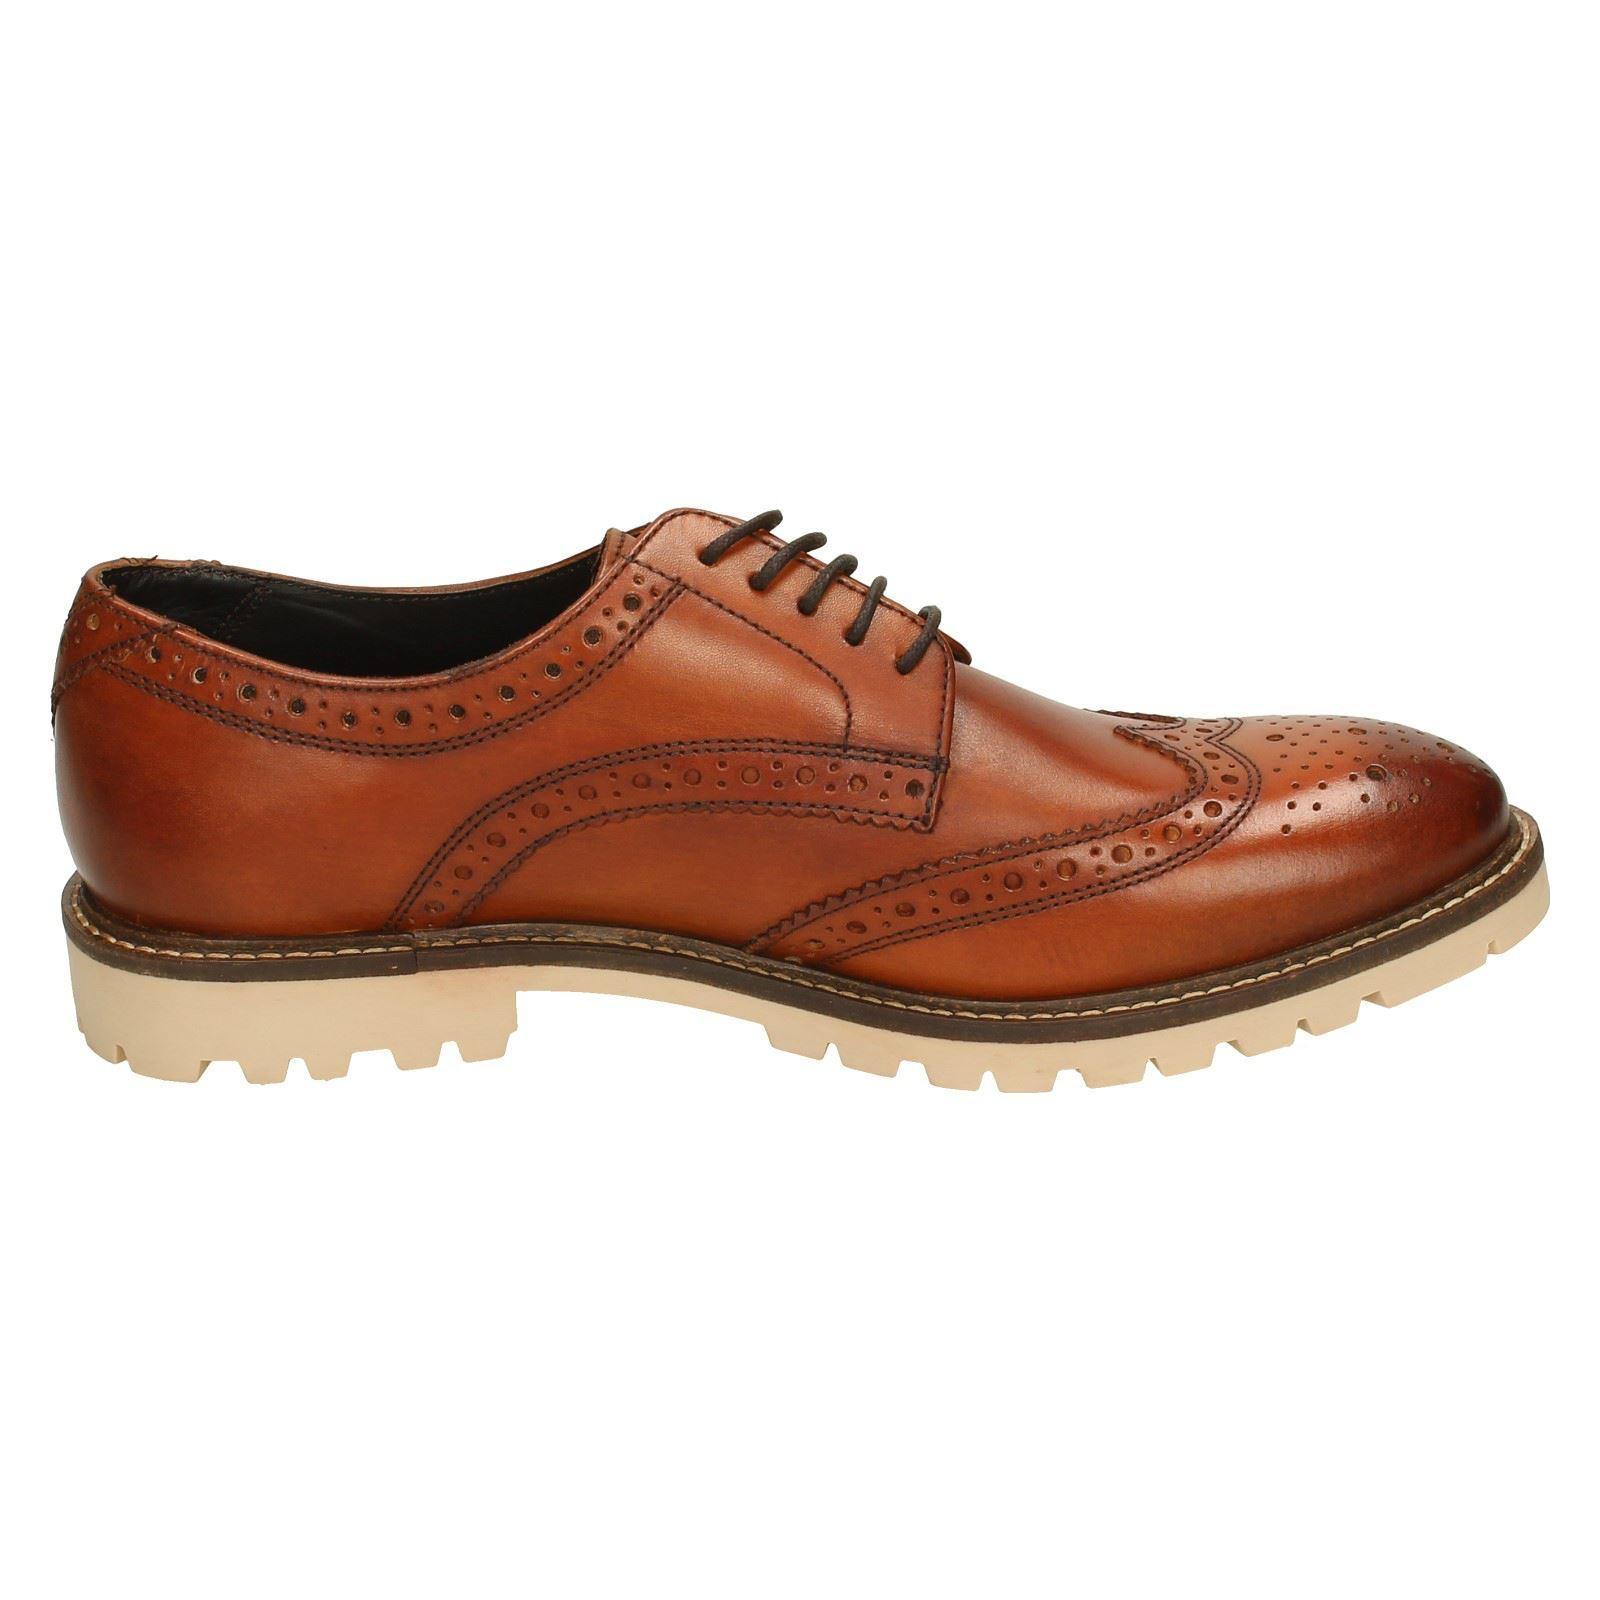 Base London' Raid 'Mens-tan gewaschen Wingtip Derby Brogues förmliche Schuhe